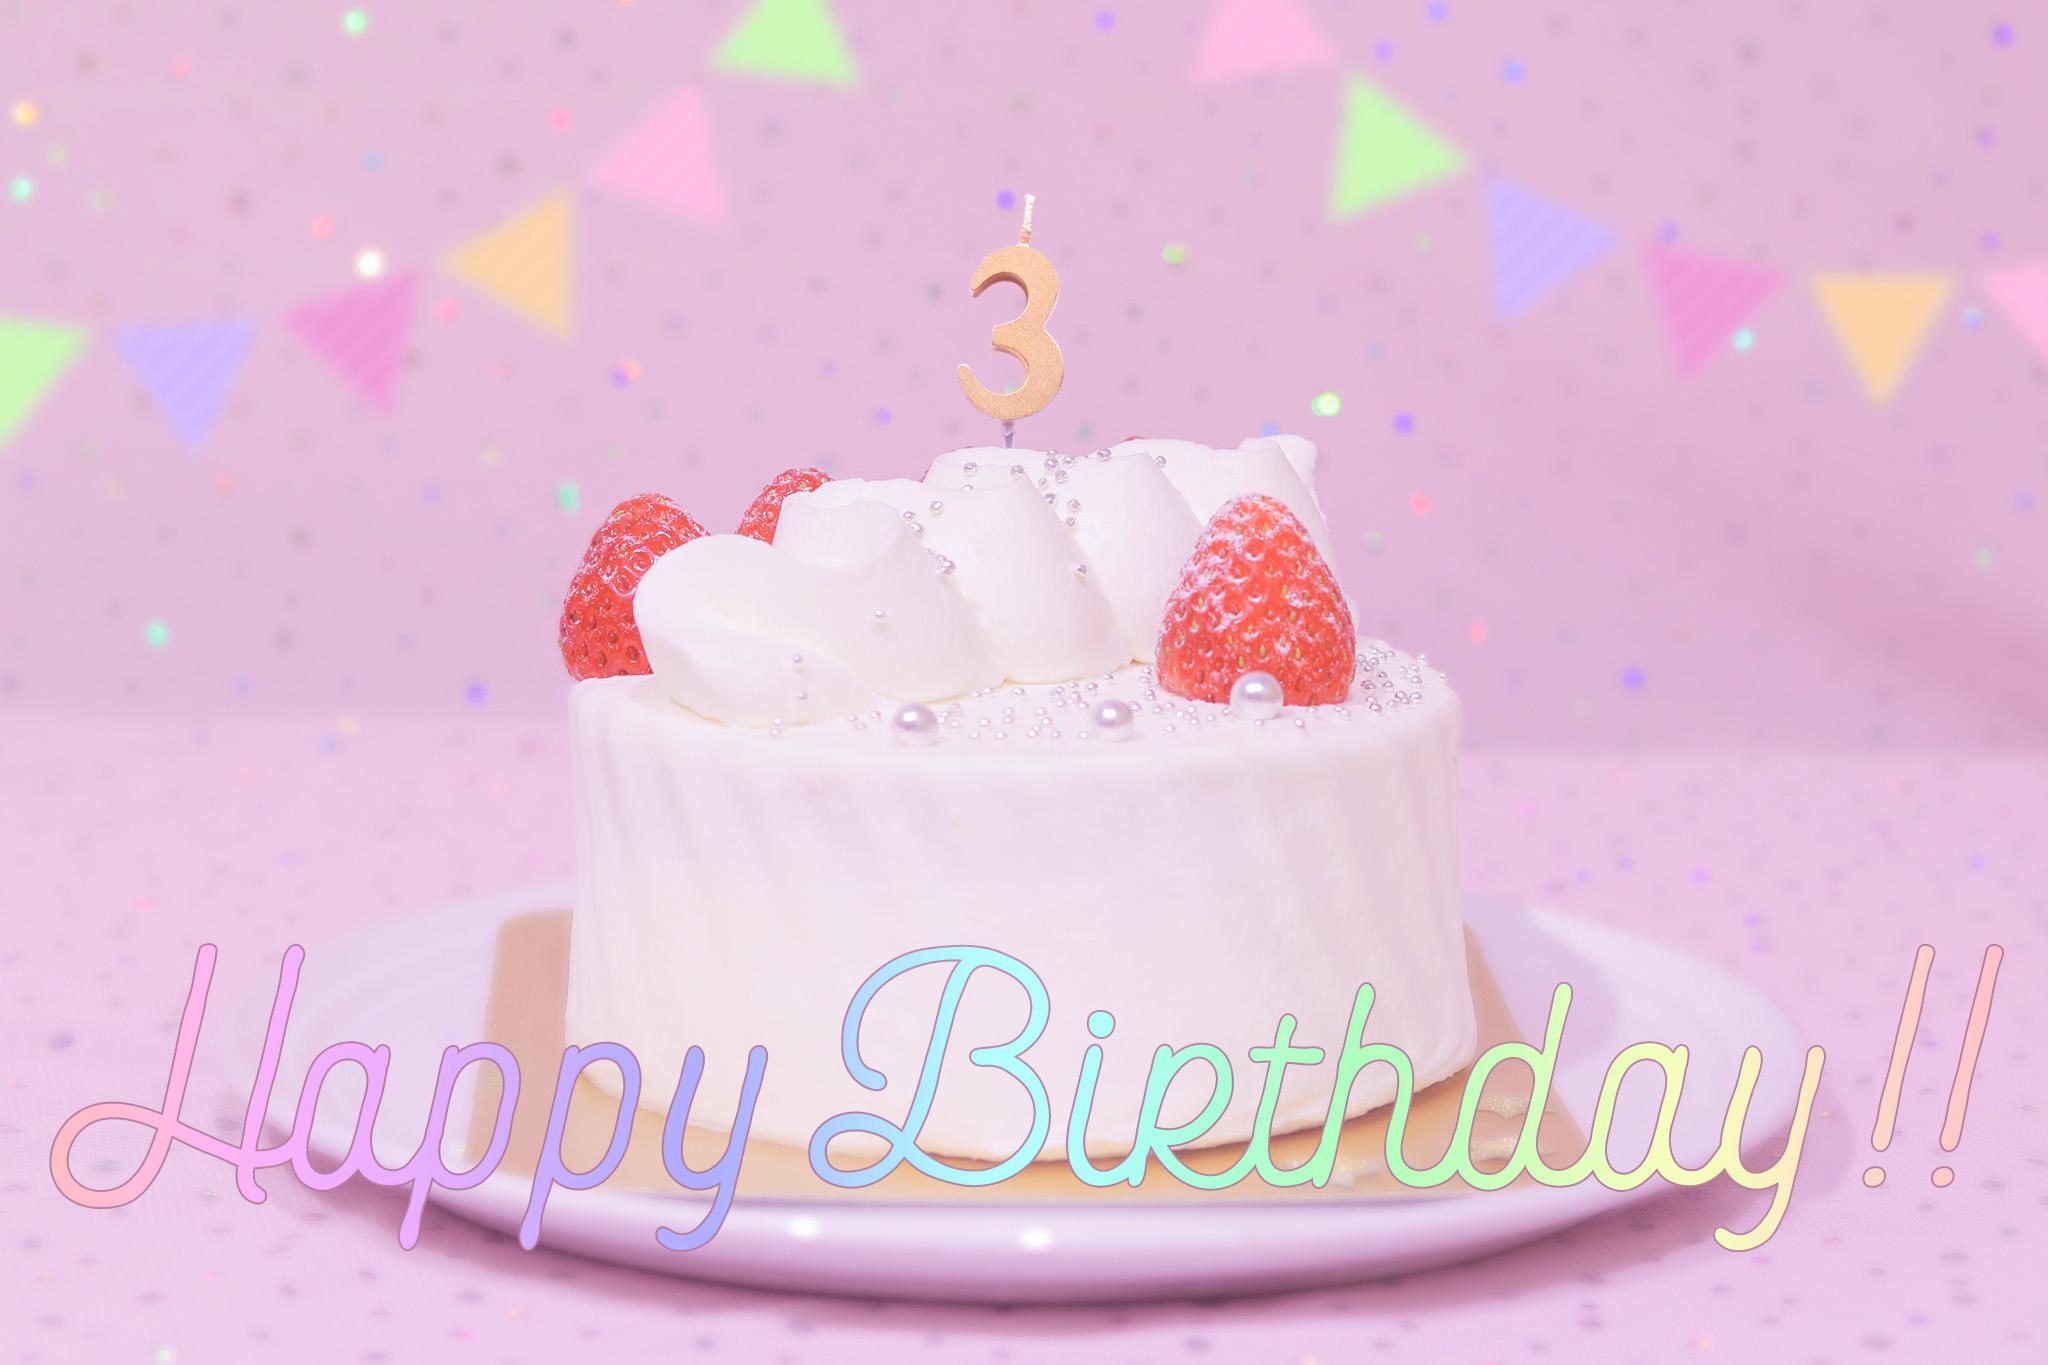 「HAPPY BIRTHDAY」「おめでとう」「お祝い」「お誕生日おめでとう」「キャンドル」「ケーキ」「年齢別」「誕生日ケーキ」などがテーマのフリー写真画像